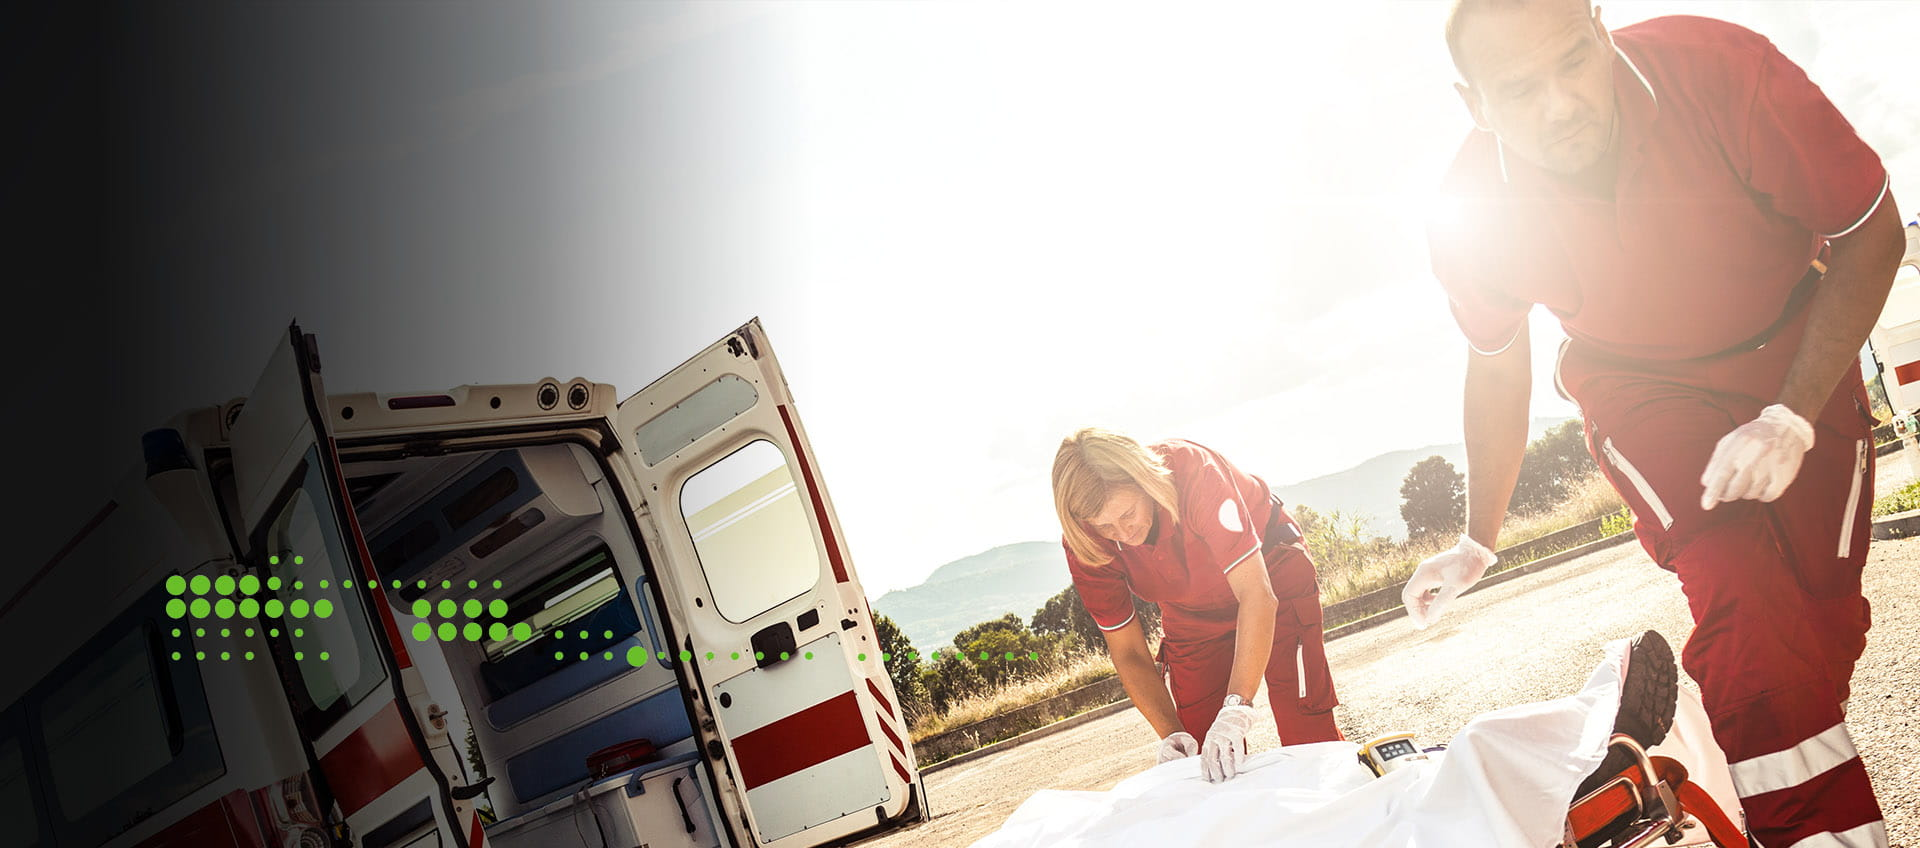 Emergency workers ambulance